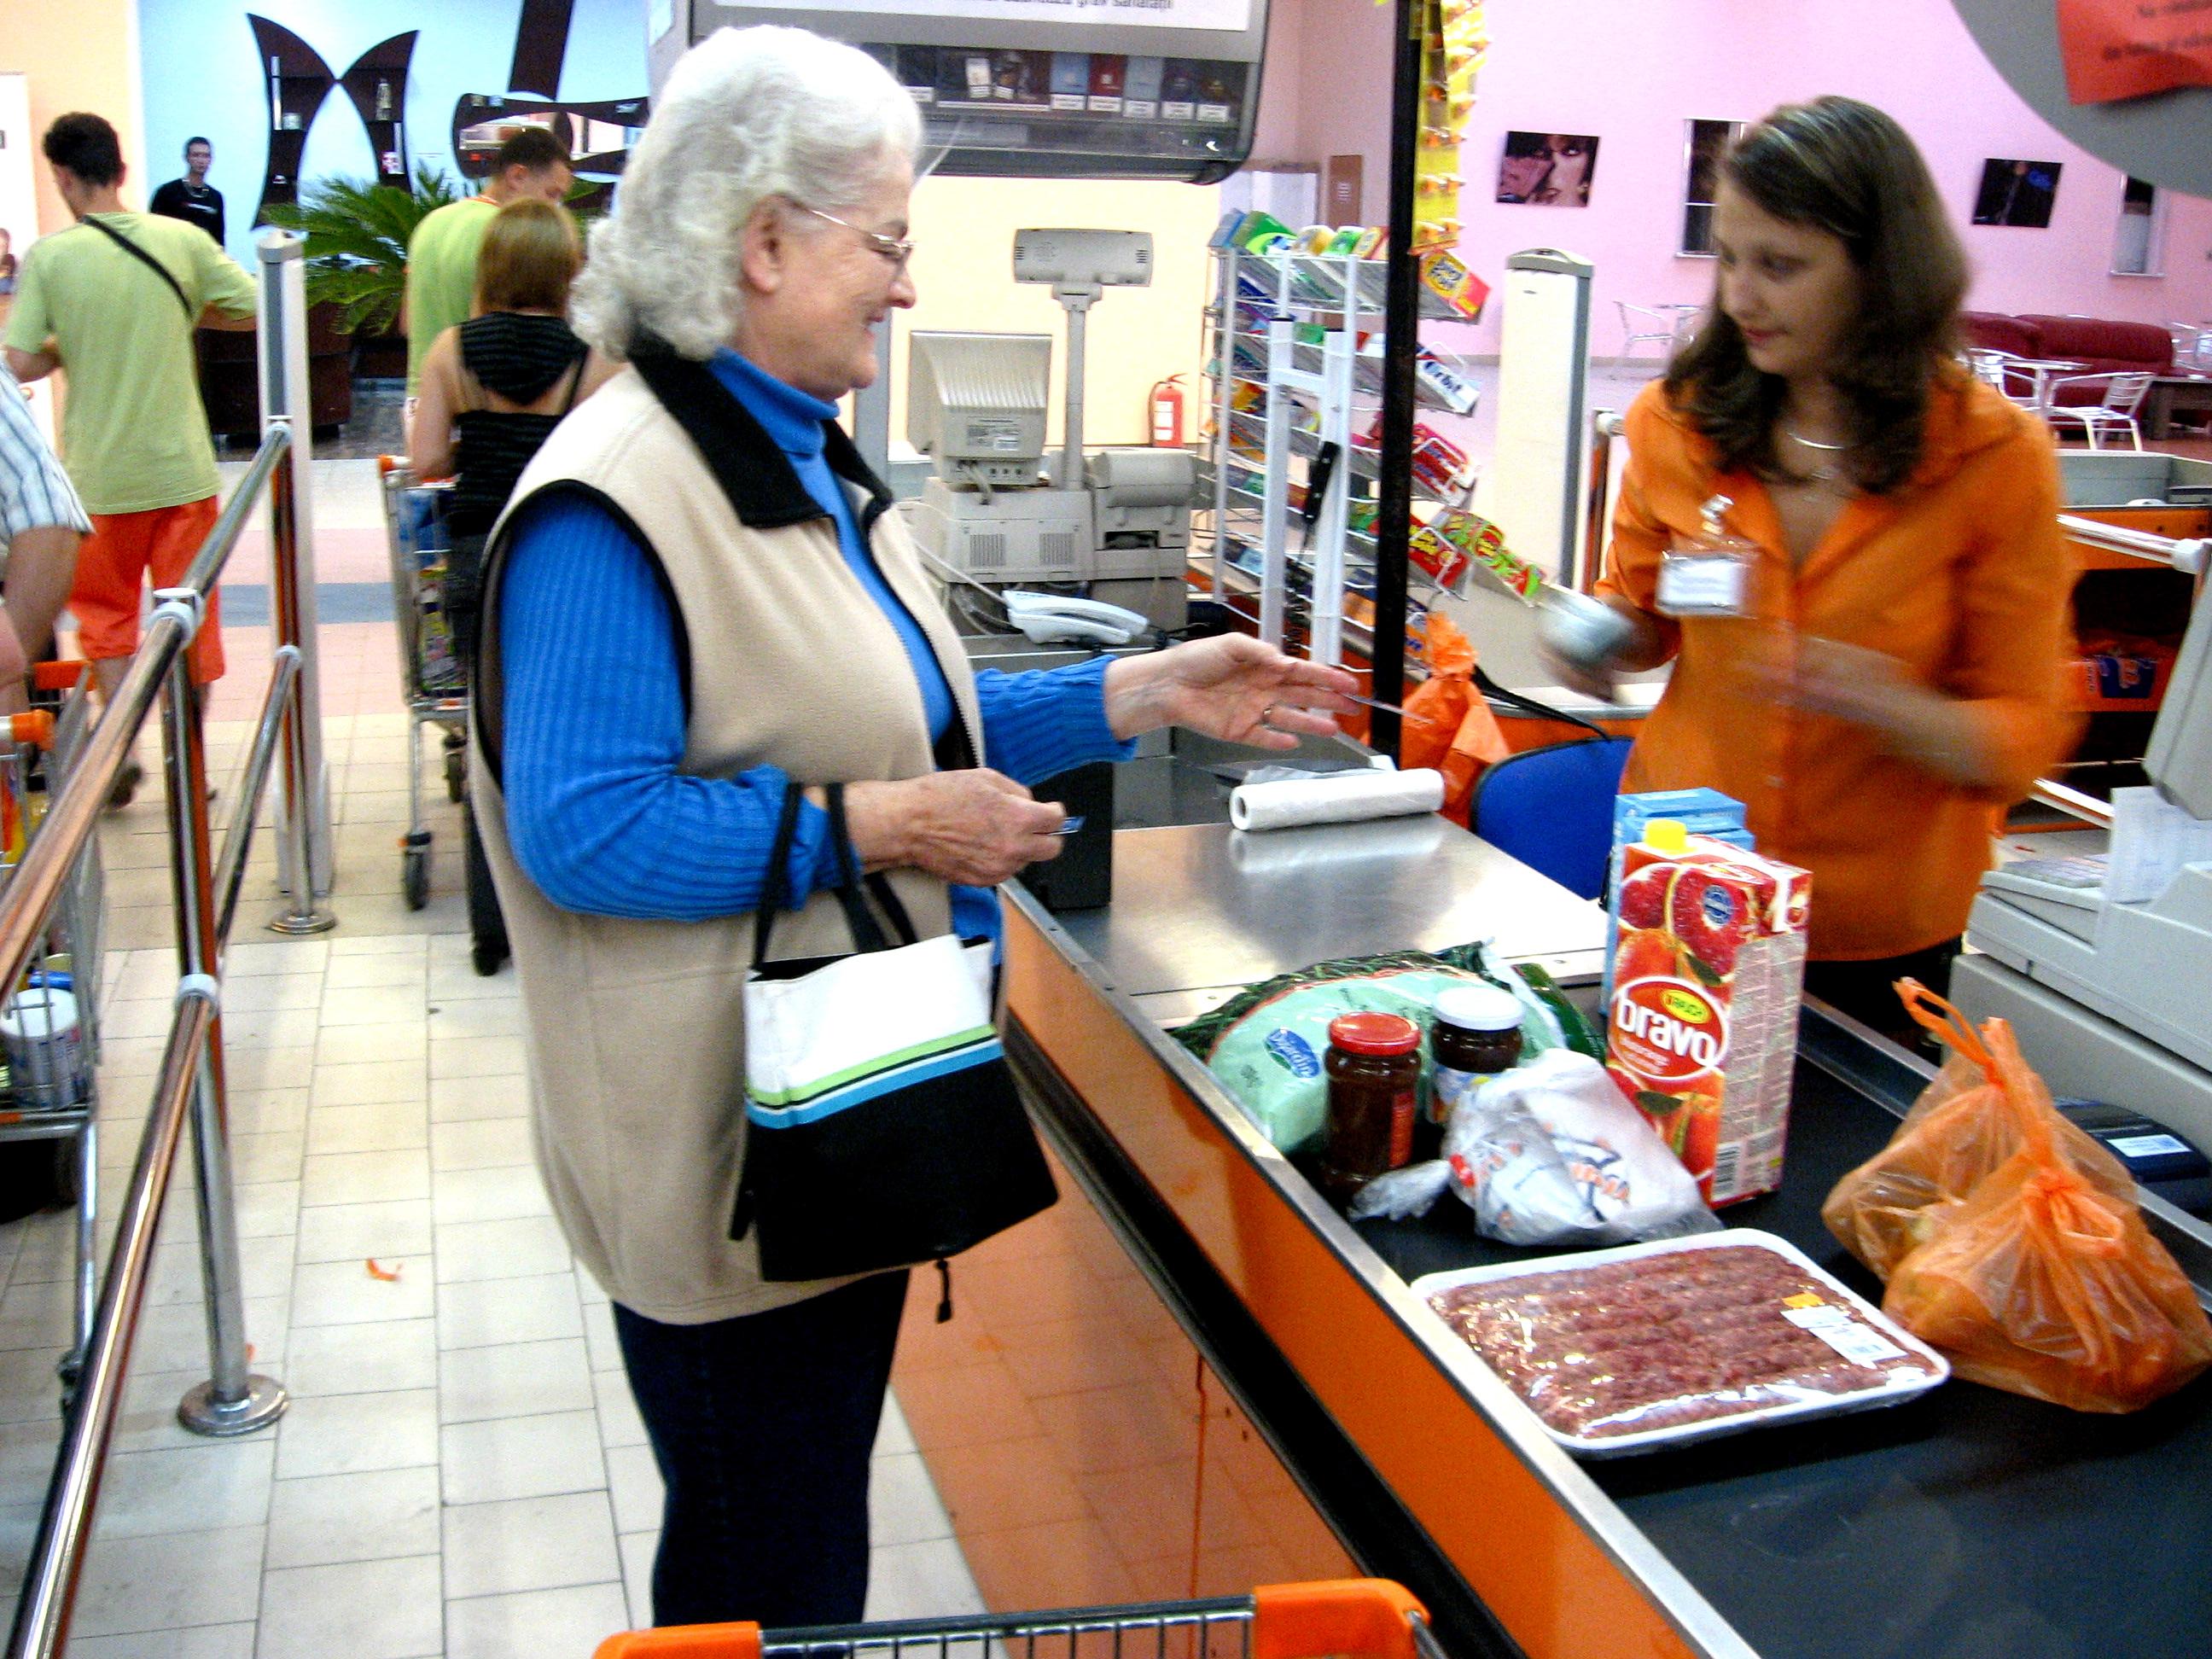 Anne Enjoys Shopping at Trident Supermarket, July 11, '08